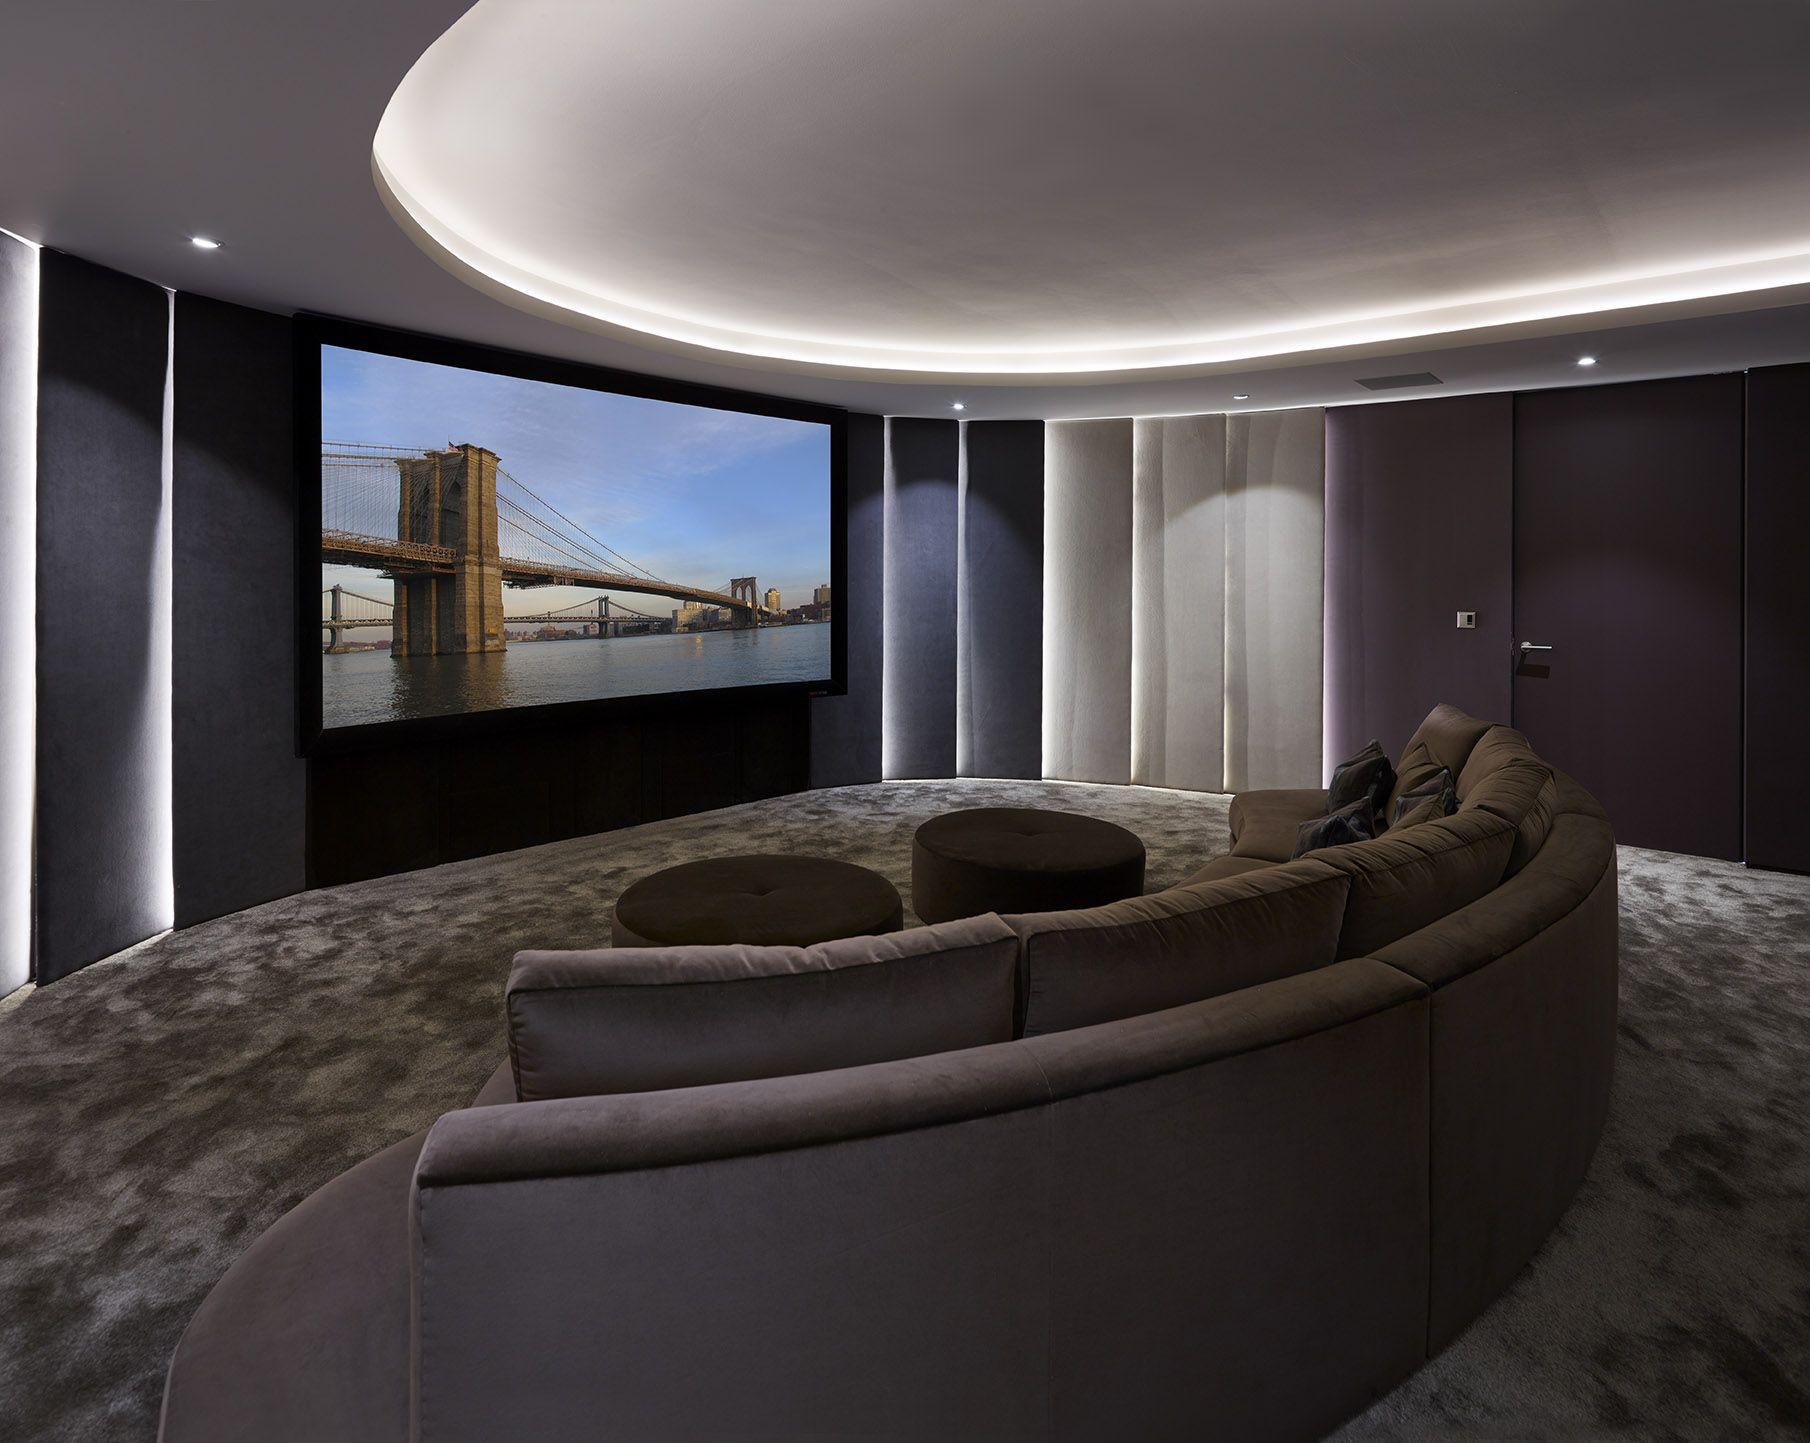 cinema room furniture. Private Cinema Room Located In The Kiln - Curved Sofa Reflects Room\u0027s Distinctive Shape While Furniture A